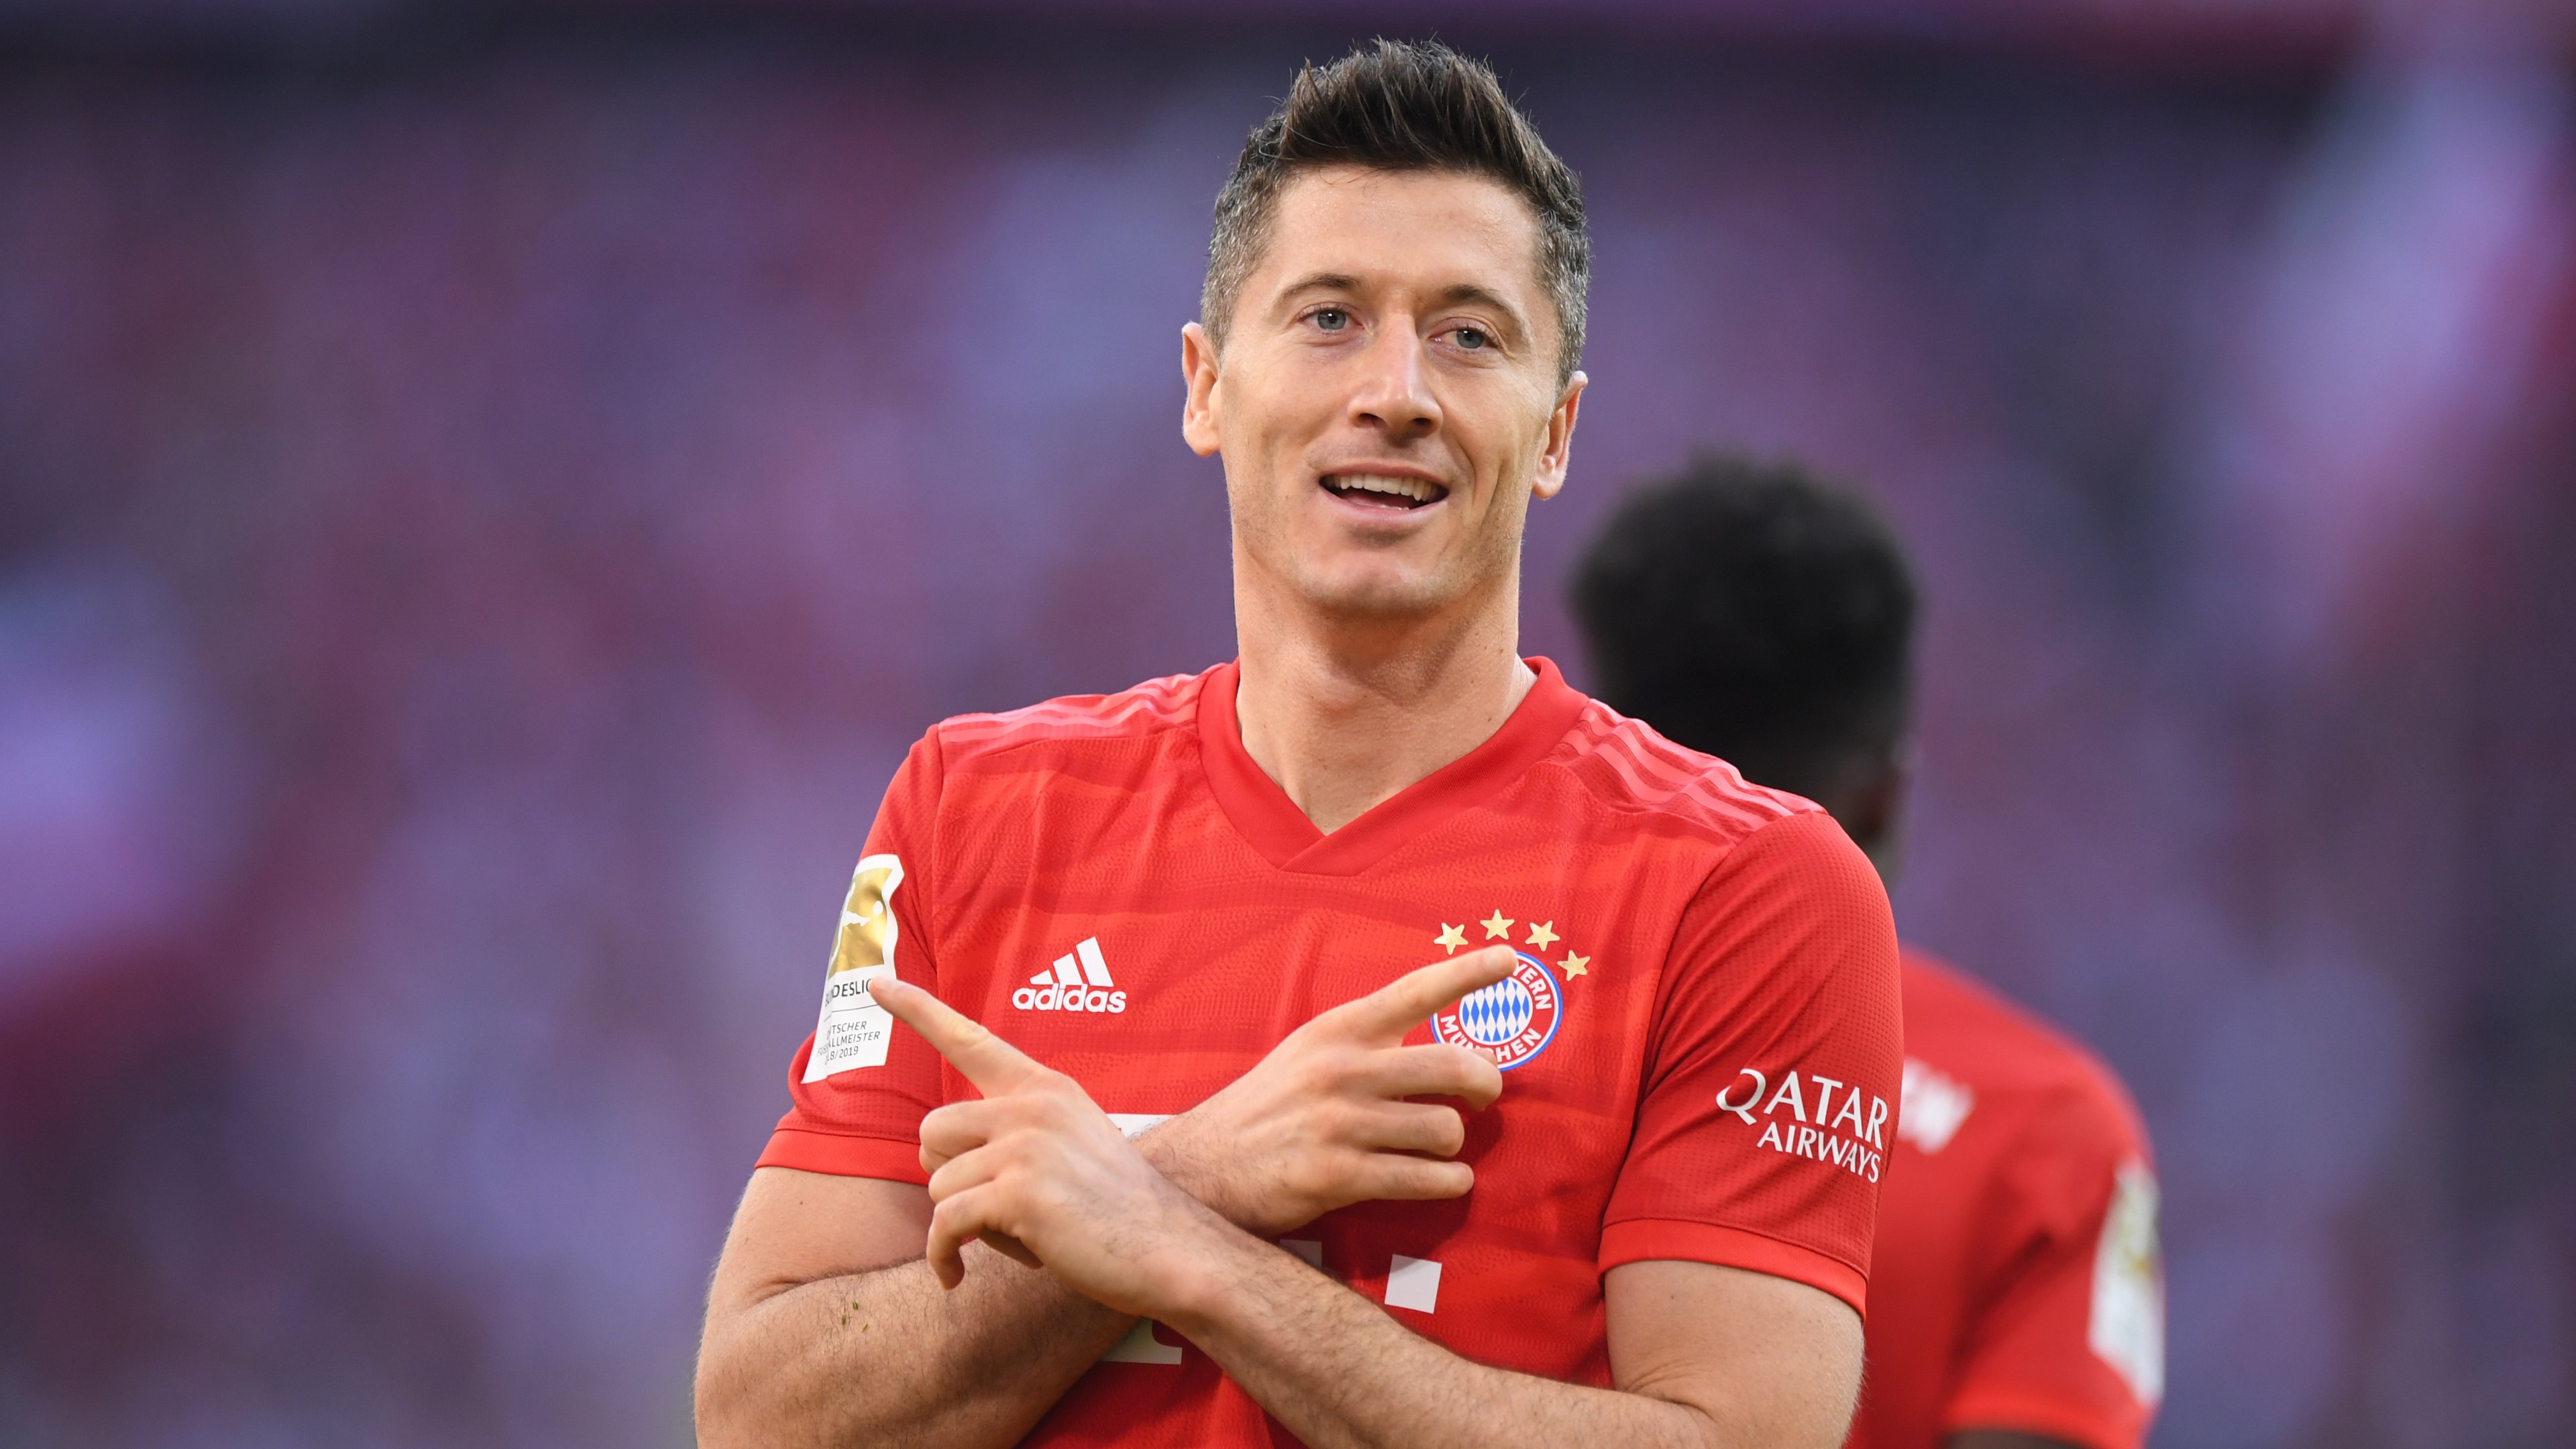 'Lewandowski's the perfect role model for Neymar' – Bayern striker 'ageing like a fine wine', says Hargreaves